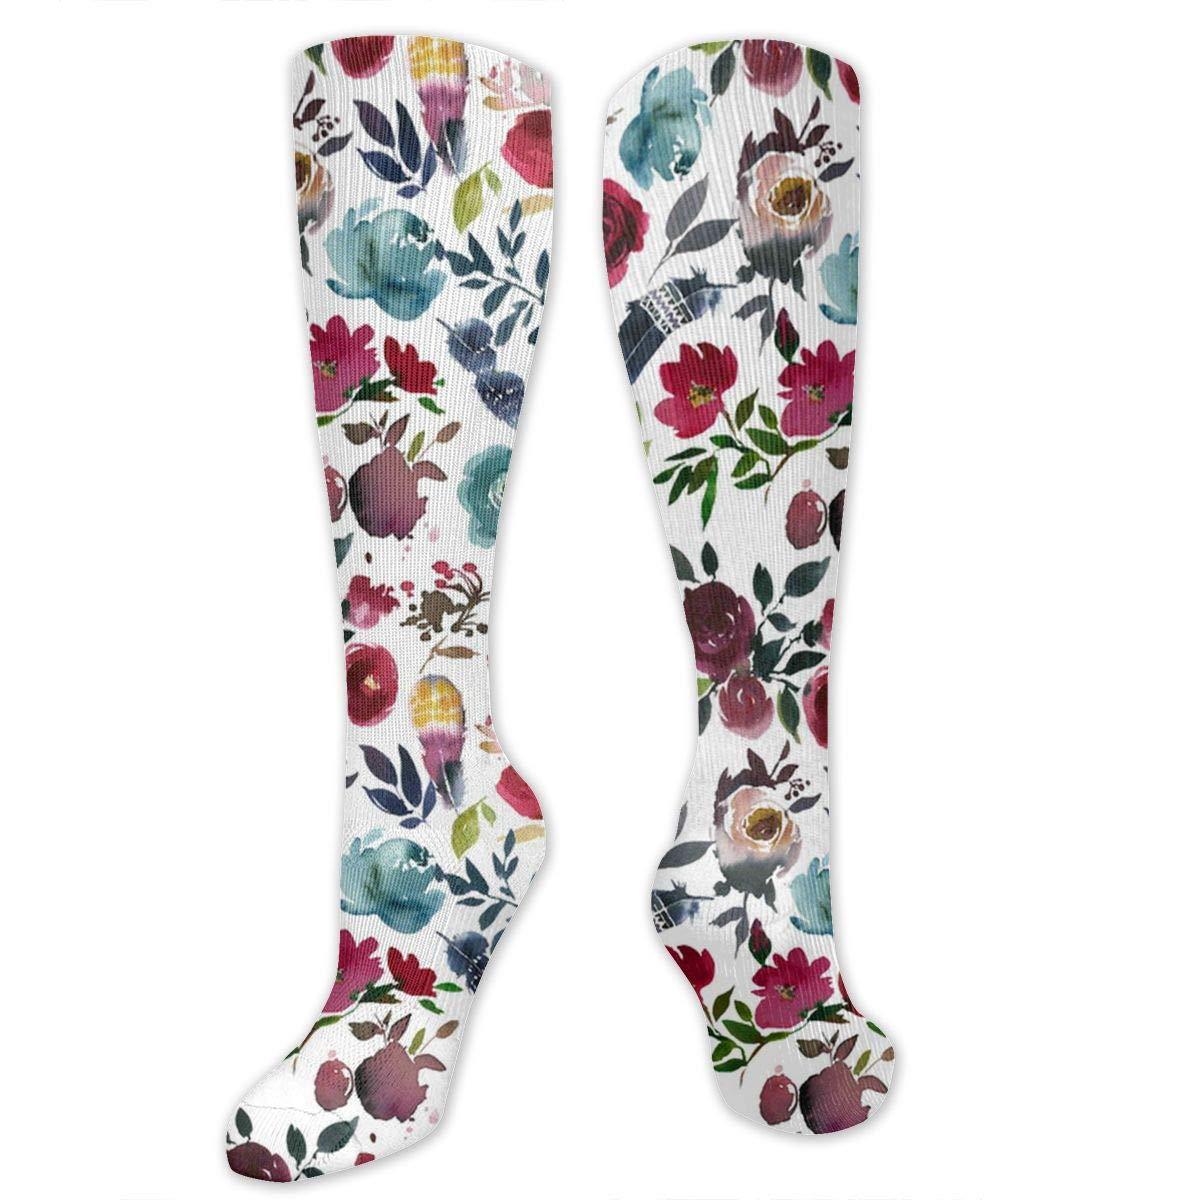 Unisex Rose Florals Pattern Knee High Compression Thigh High Socks Soccer Tube Sock